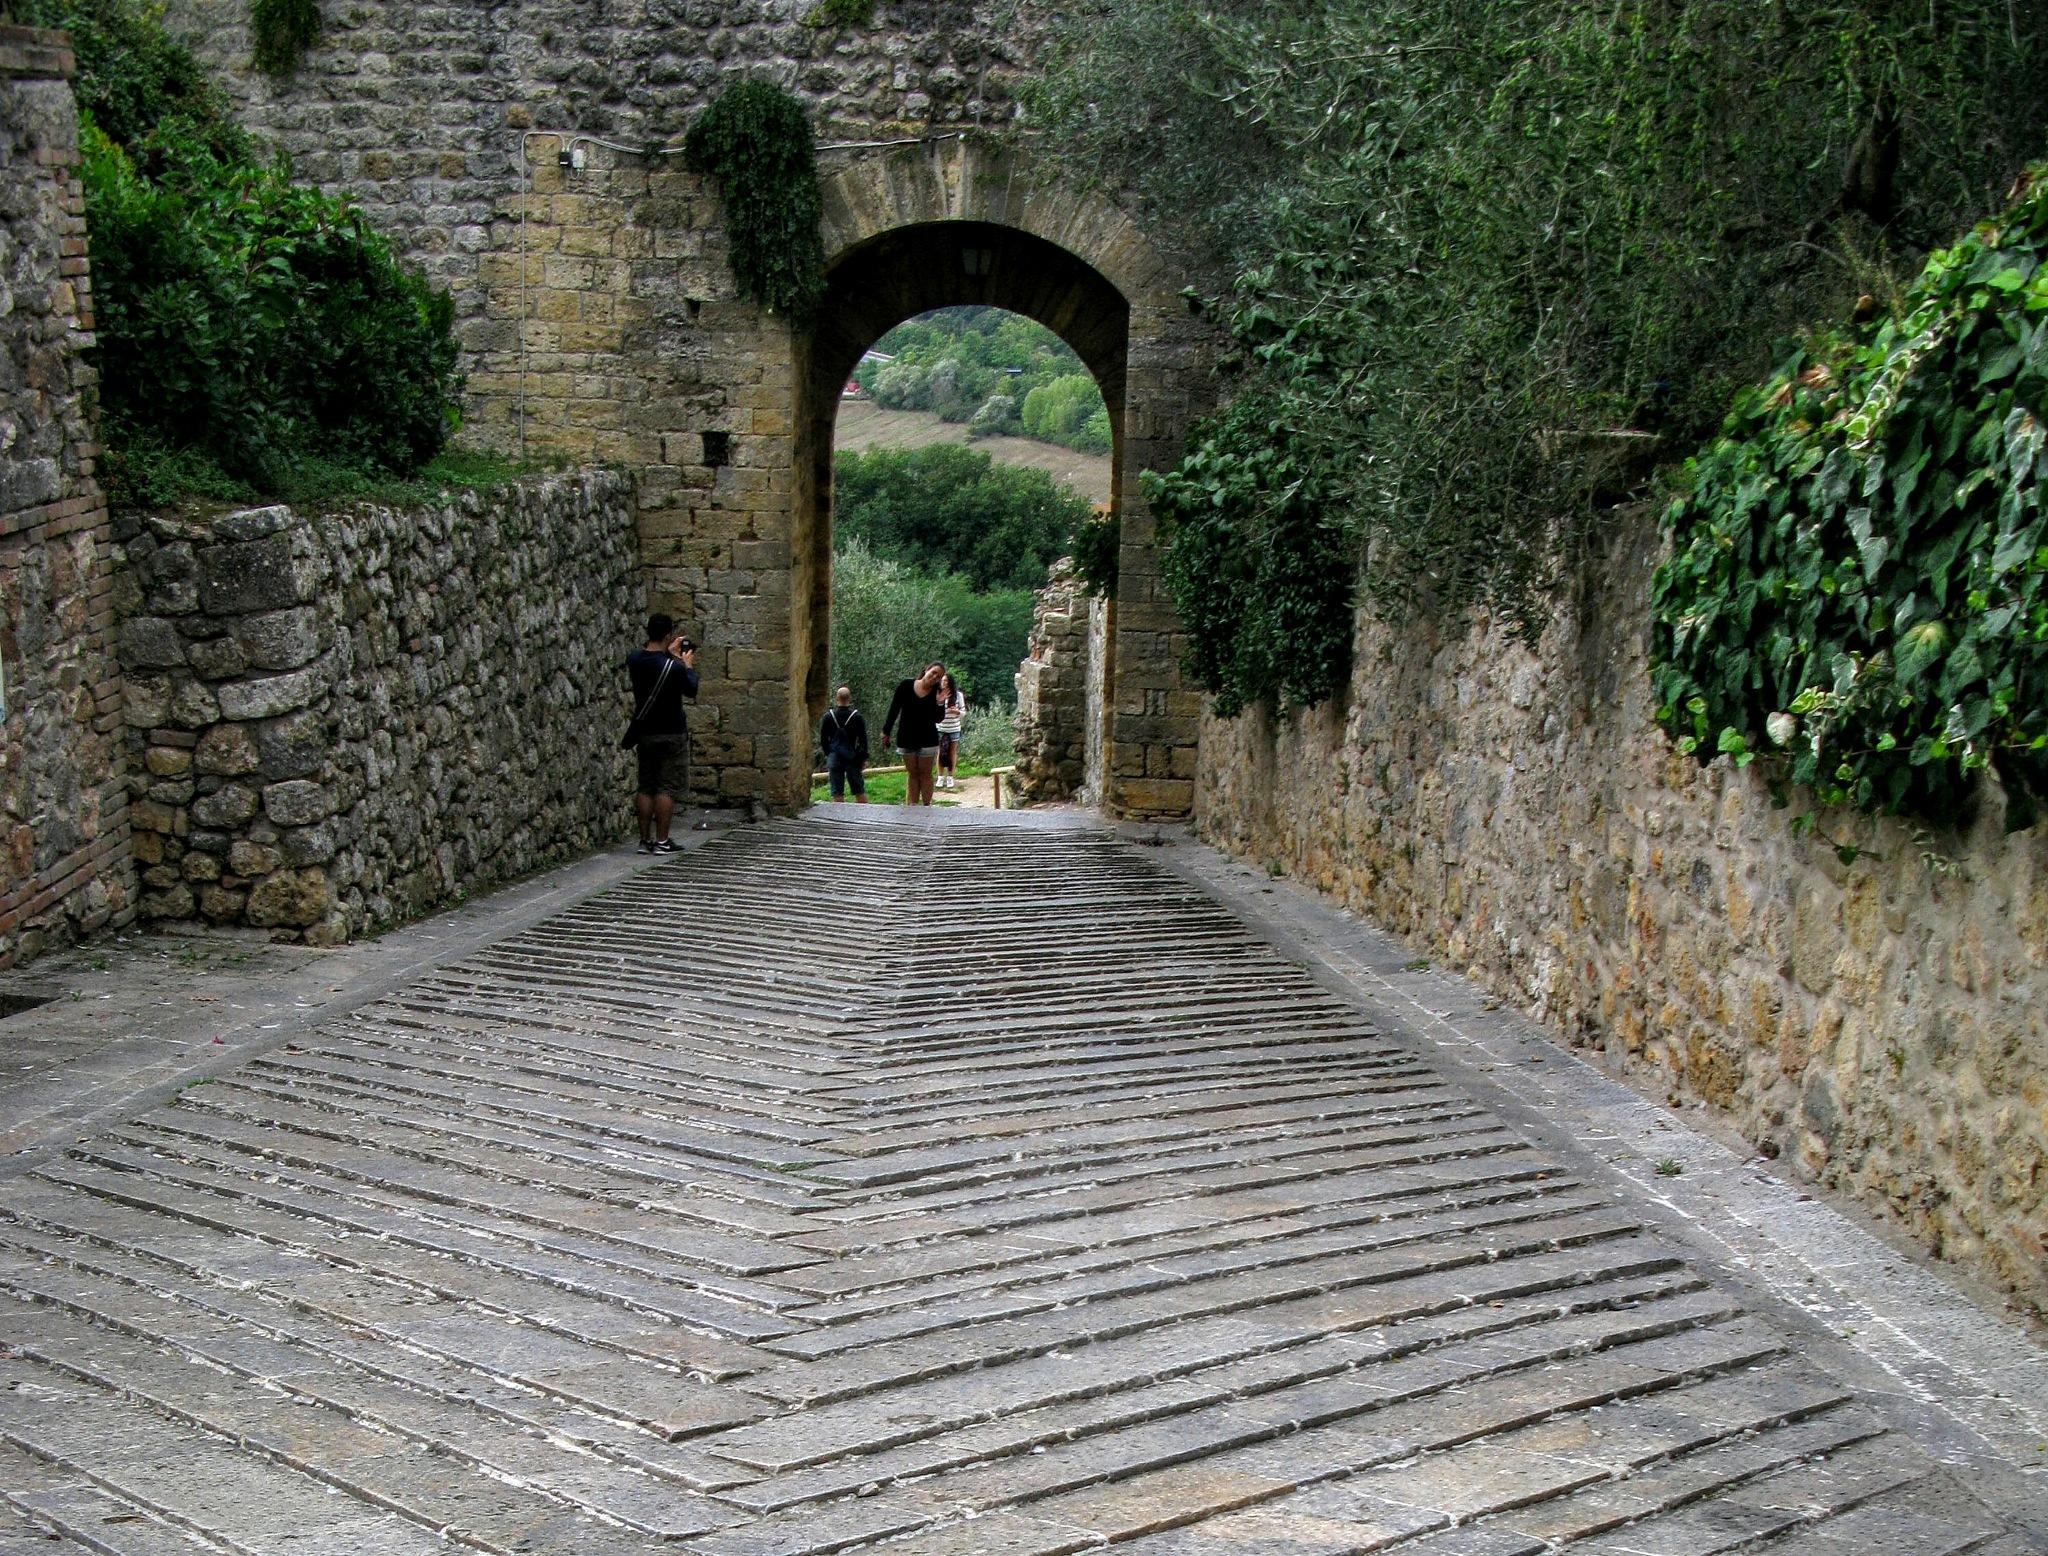 A medieval gate in Monteriggioni by Ela Gajowska